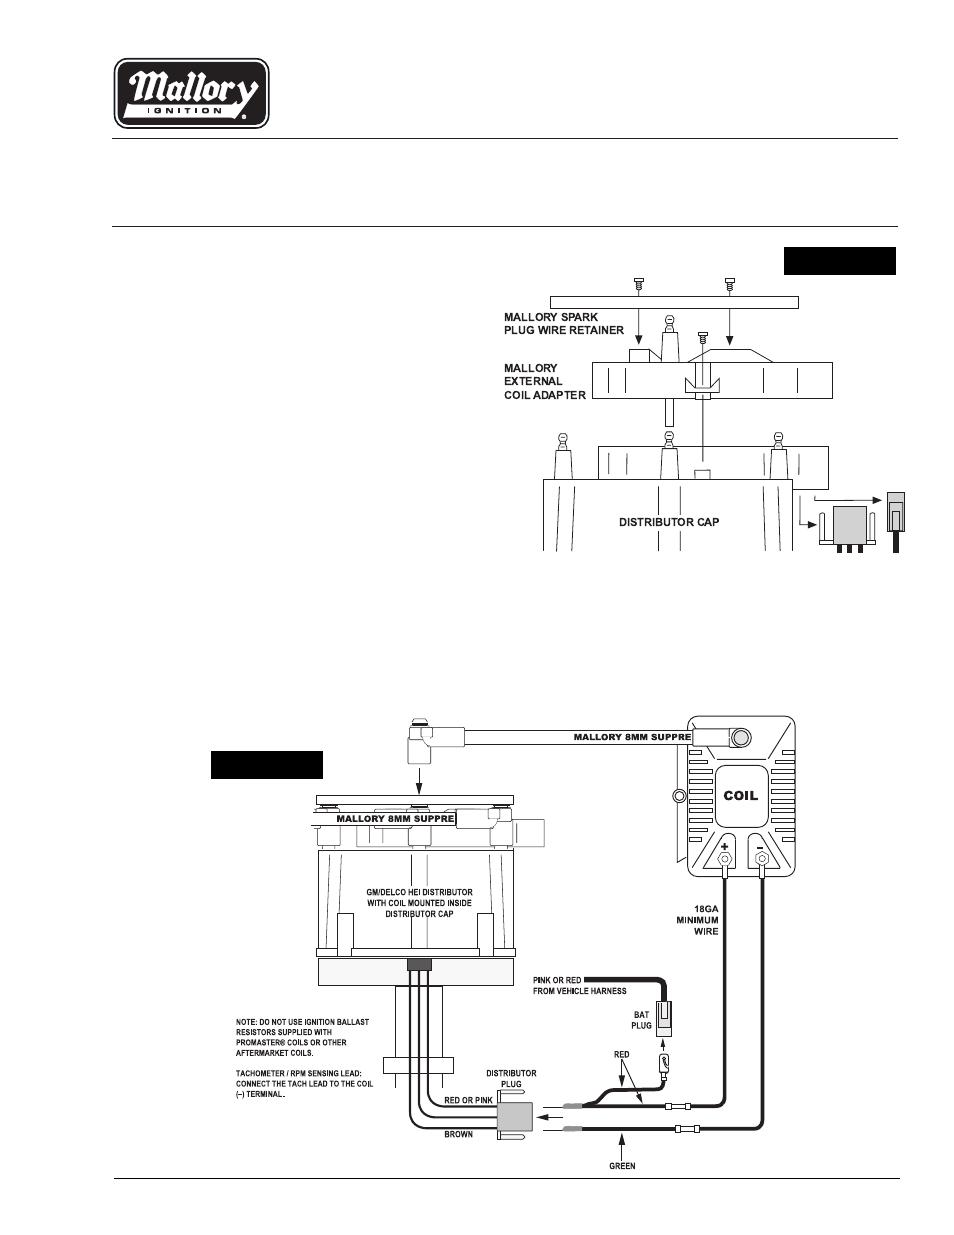 attractive mallory tachometer wiring diagram inspiration schematic tach wiring diagram stunning mallory ignition wiring diagram digital motorcycle ideas